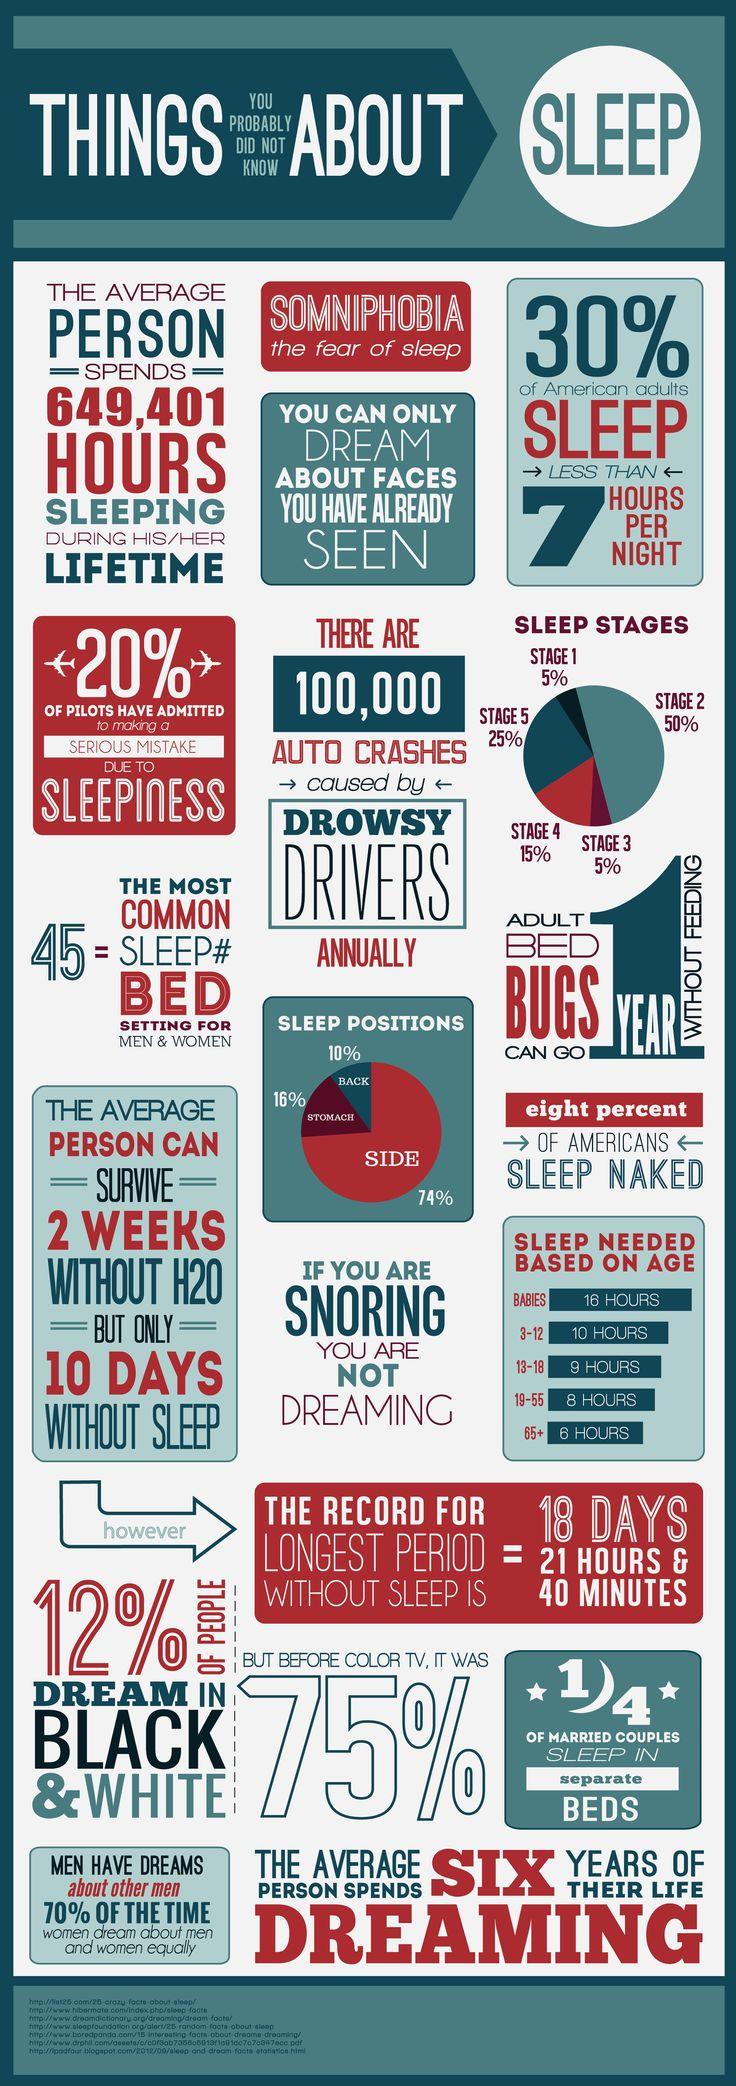 Sleep Facts #sleep #parenting #parentingtips #parentingadvice #lpa #lpatucson #lapalomaacademy #lapaloma | La Paloma Academy, AZ